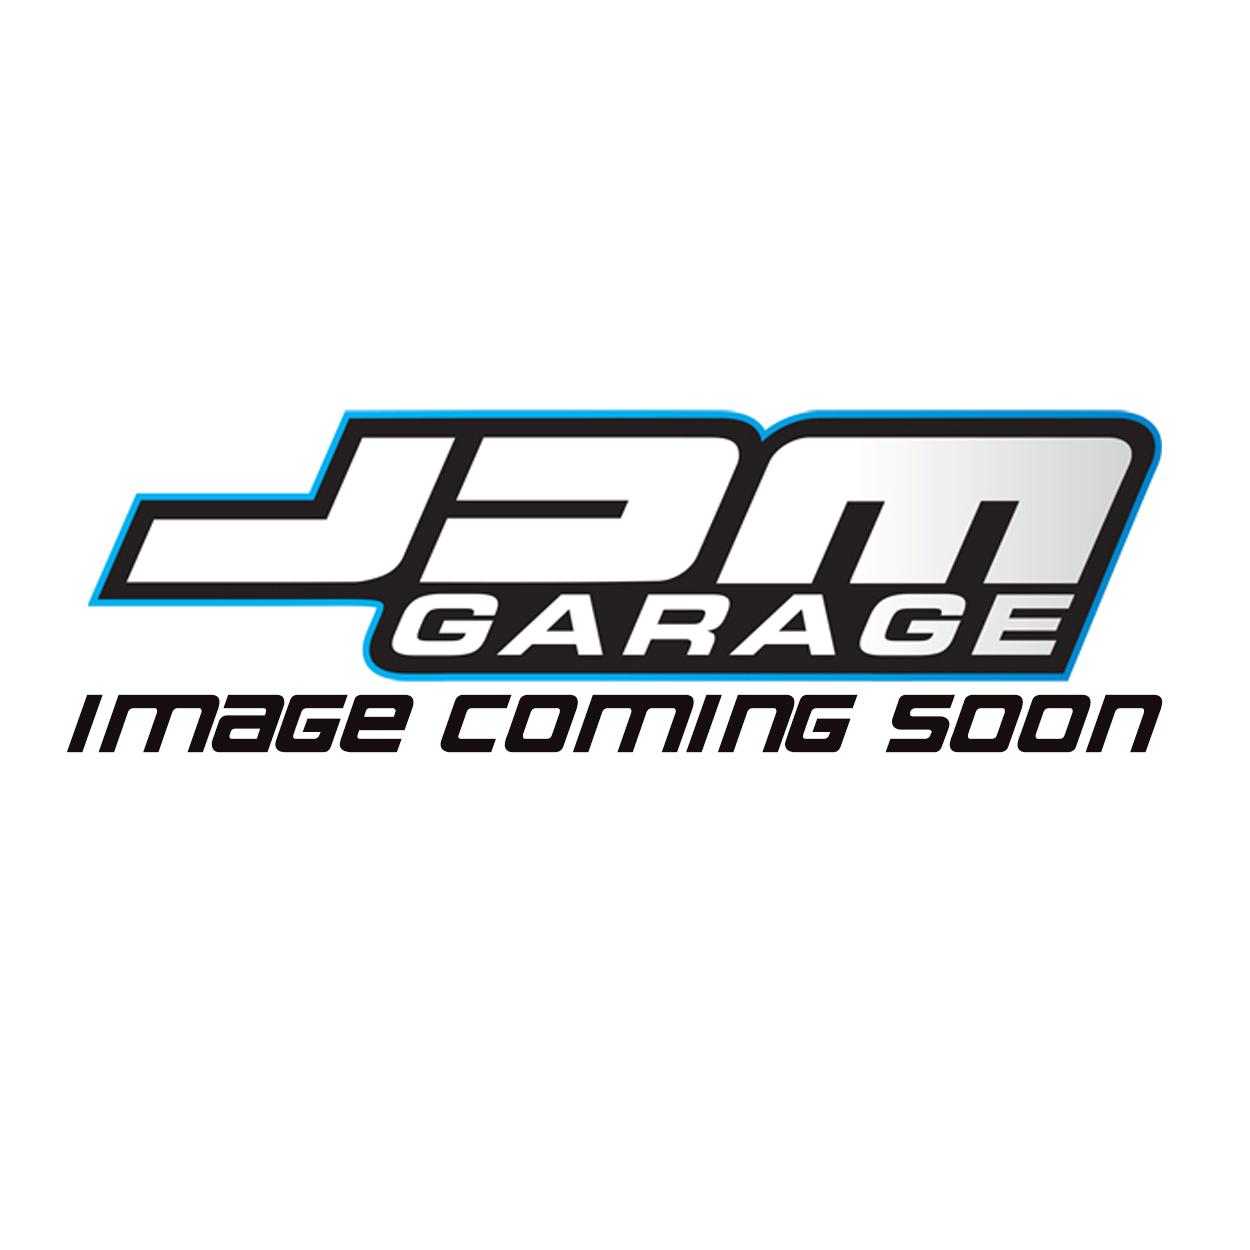 Genuine Nissan Rear Anti Rollbar ARB Clamp Bracket Fits Silvia S13 S14 S15 Skyline R31 R32 R33 R34 Stagea WC34 Cefiro A31 FairladyZ Z32 56233-01P10